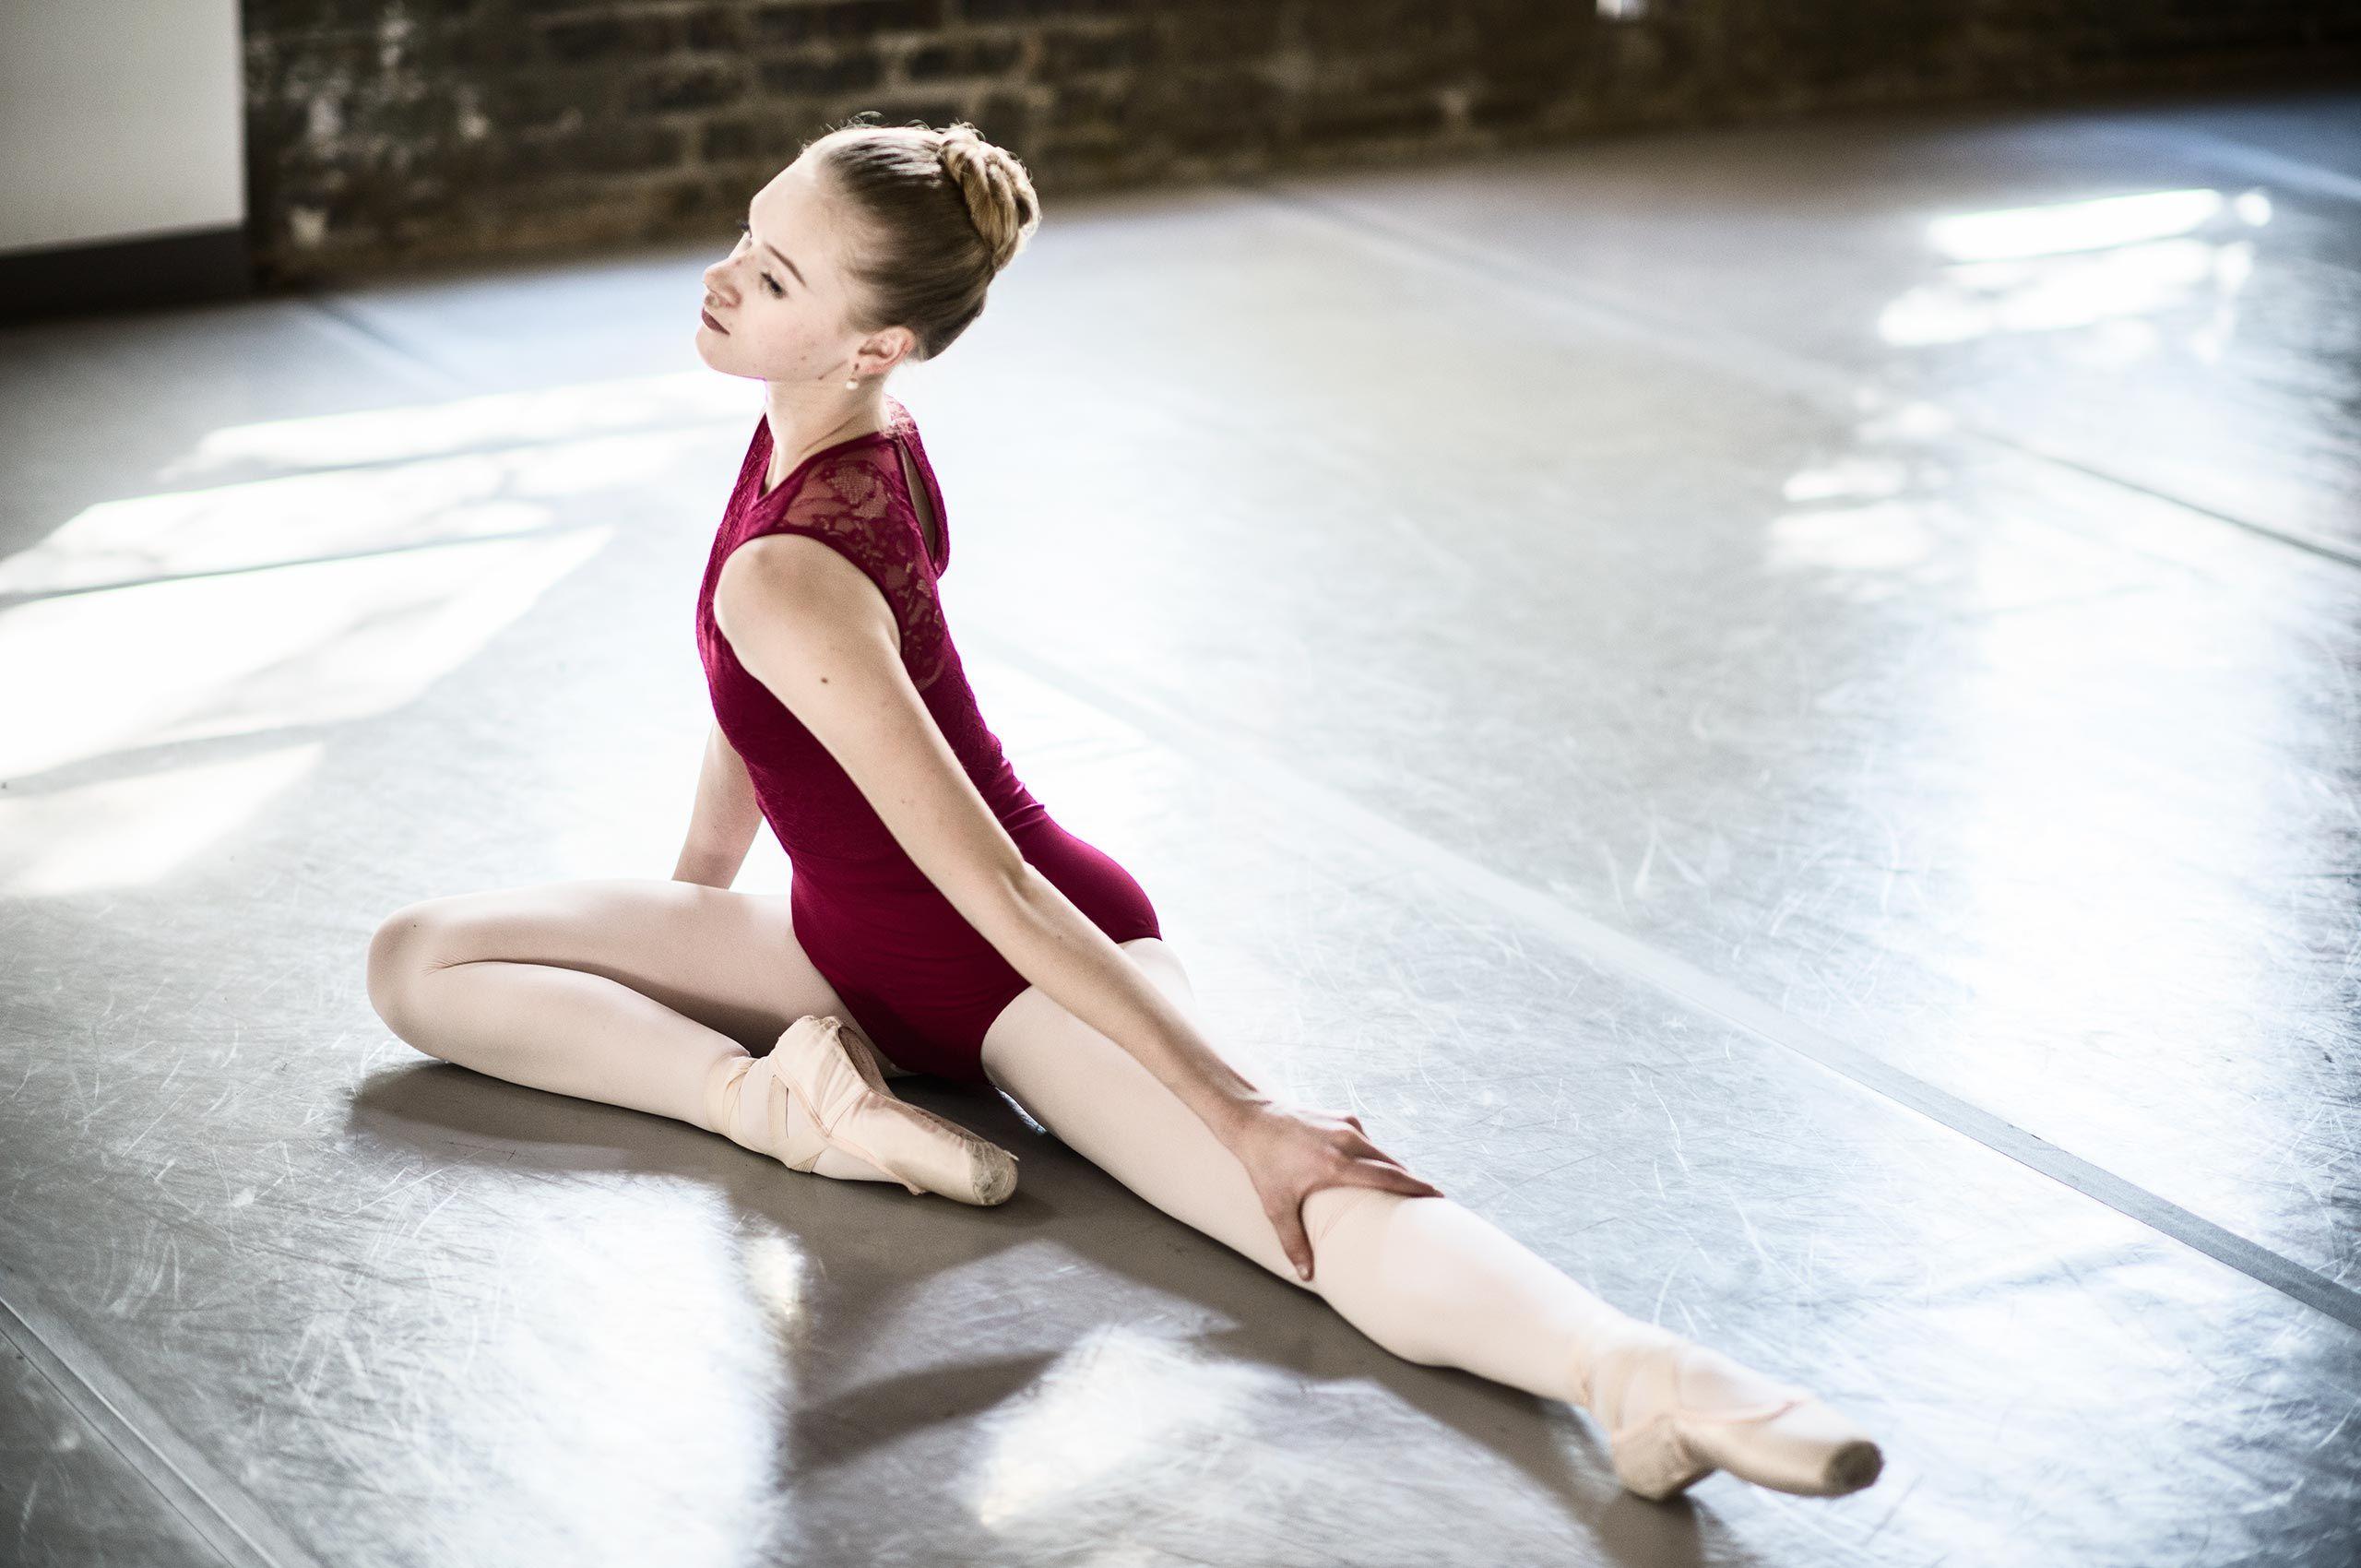 ballerina-stretching-SavvanahLyle-HenrikOlundPhotography.jpg